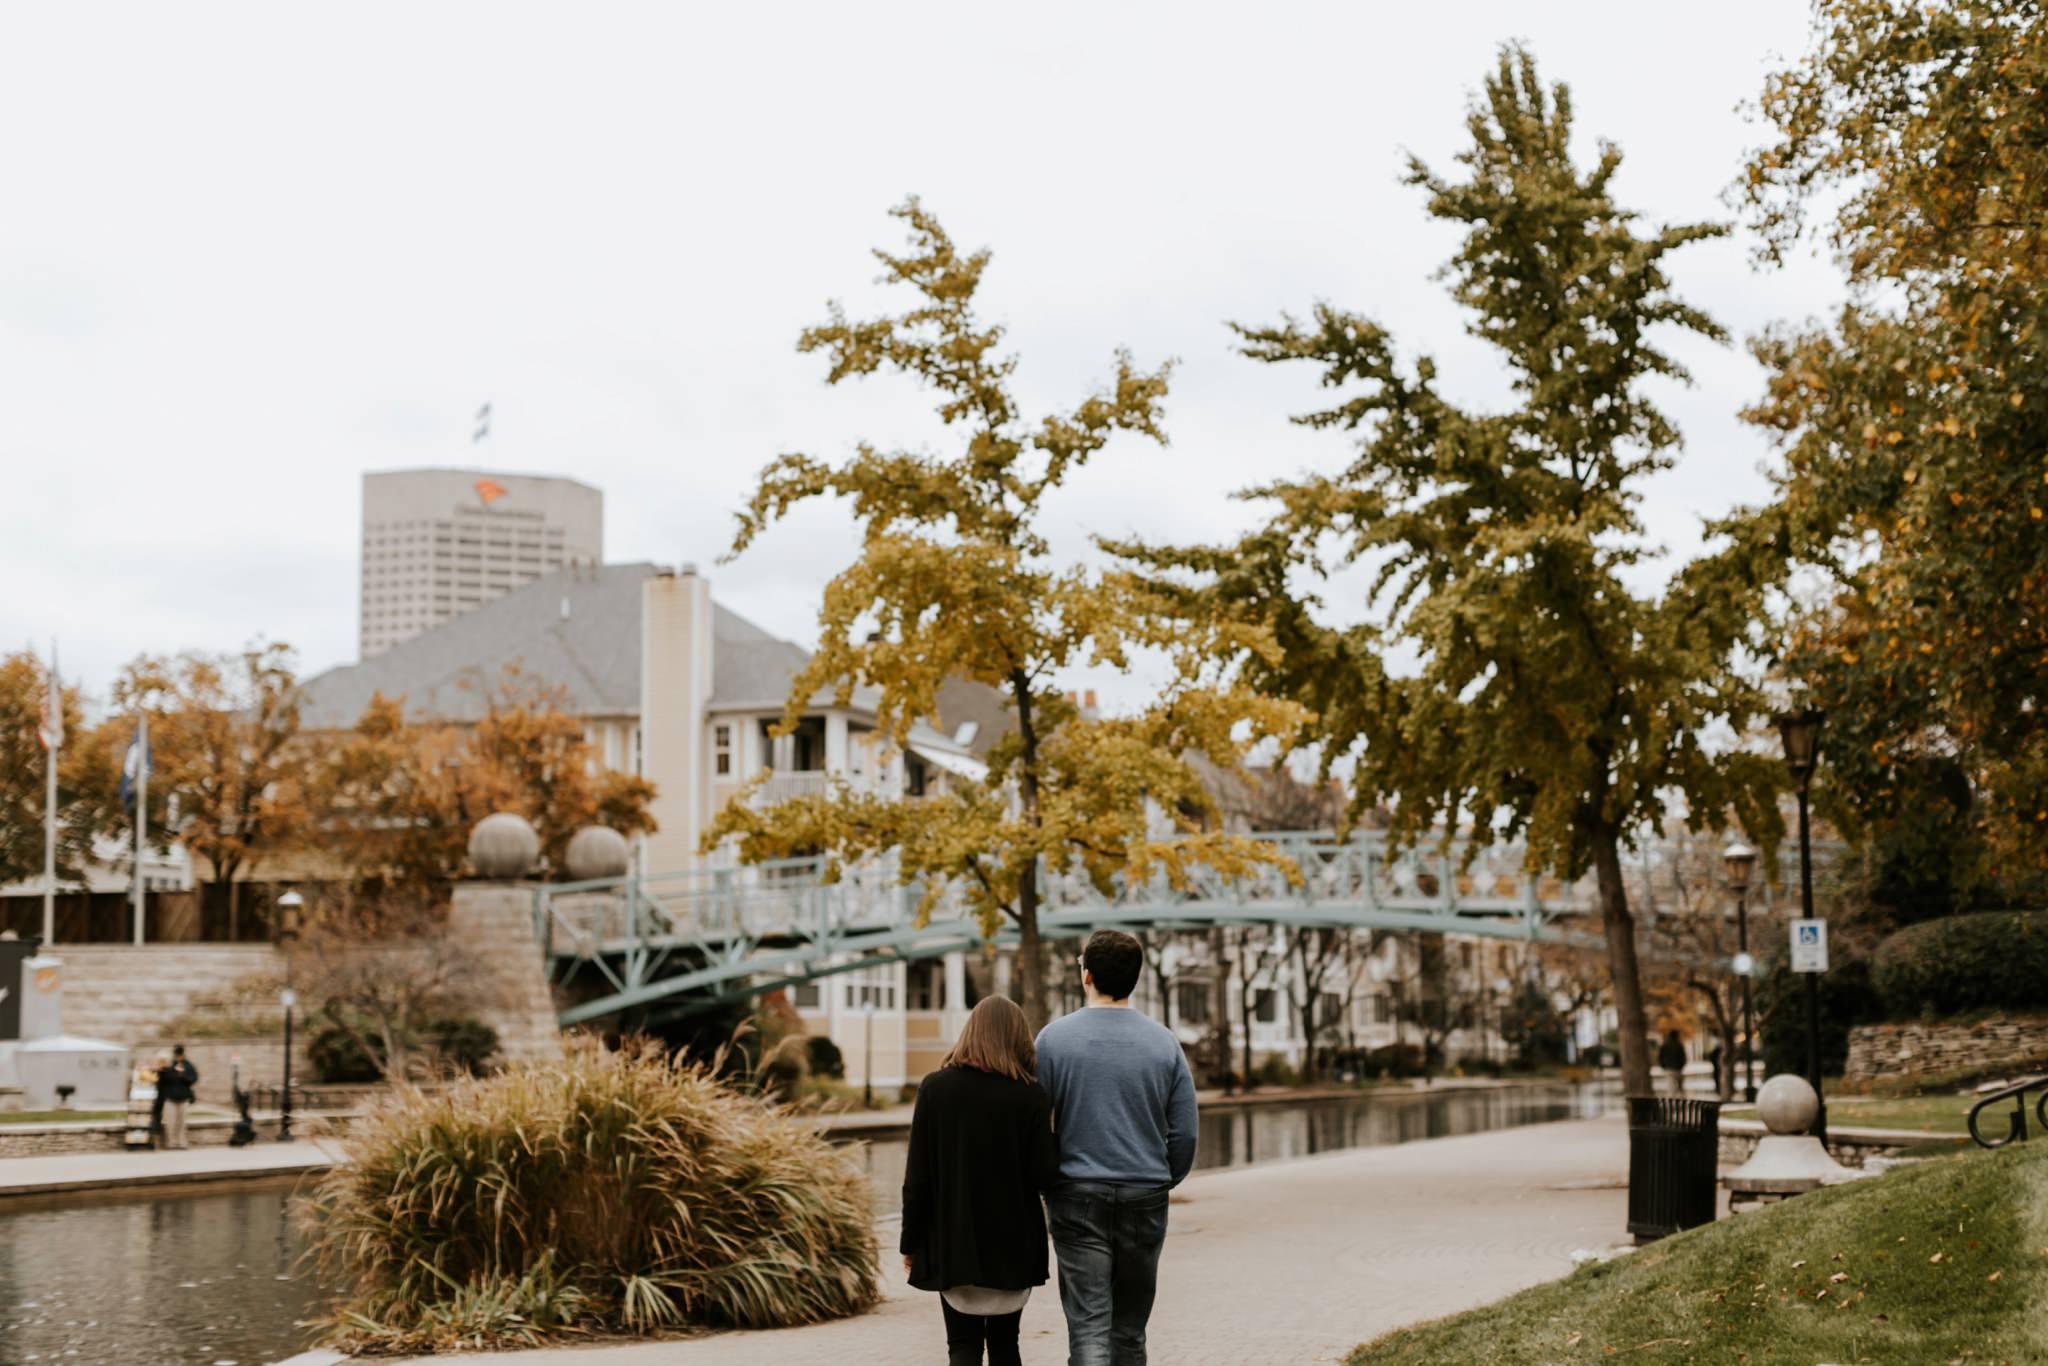 17-10-28 Carly and David Engagement Edited-74_WEB.jpg